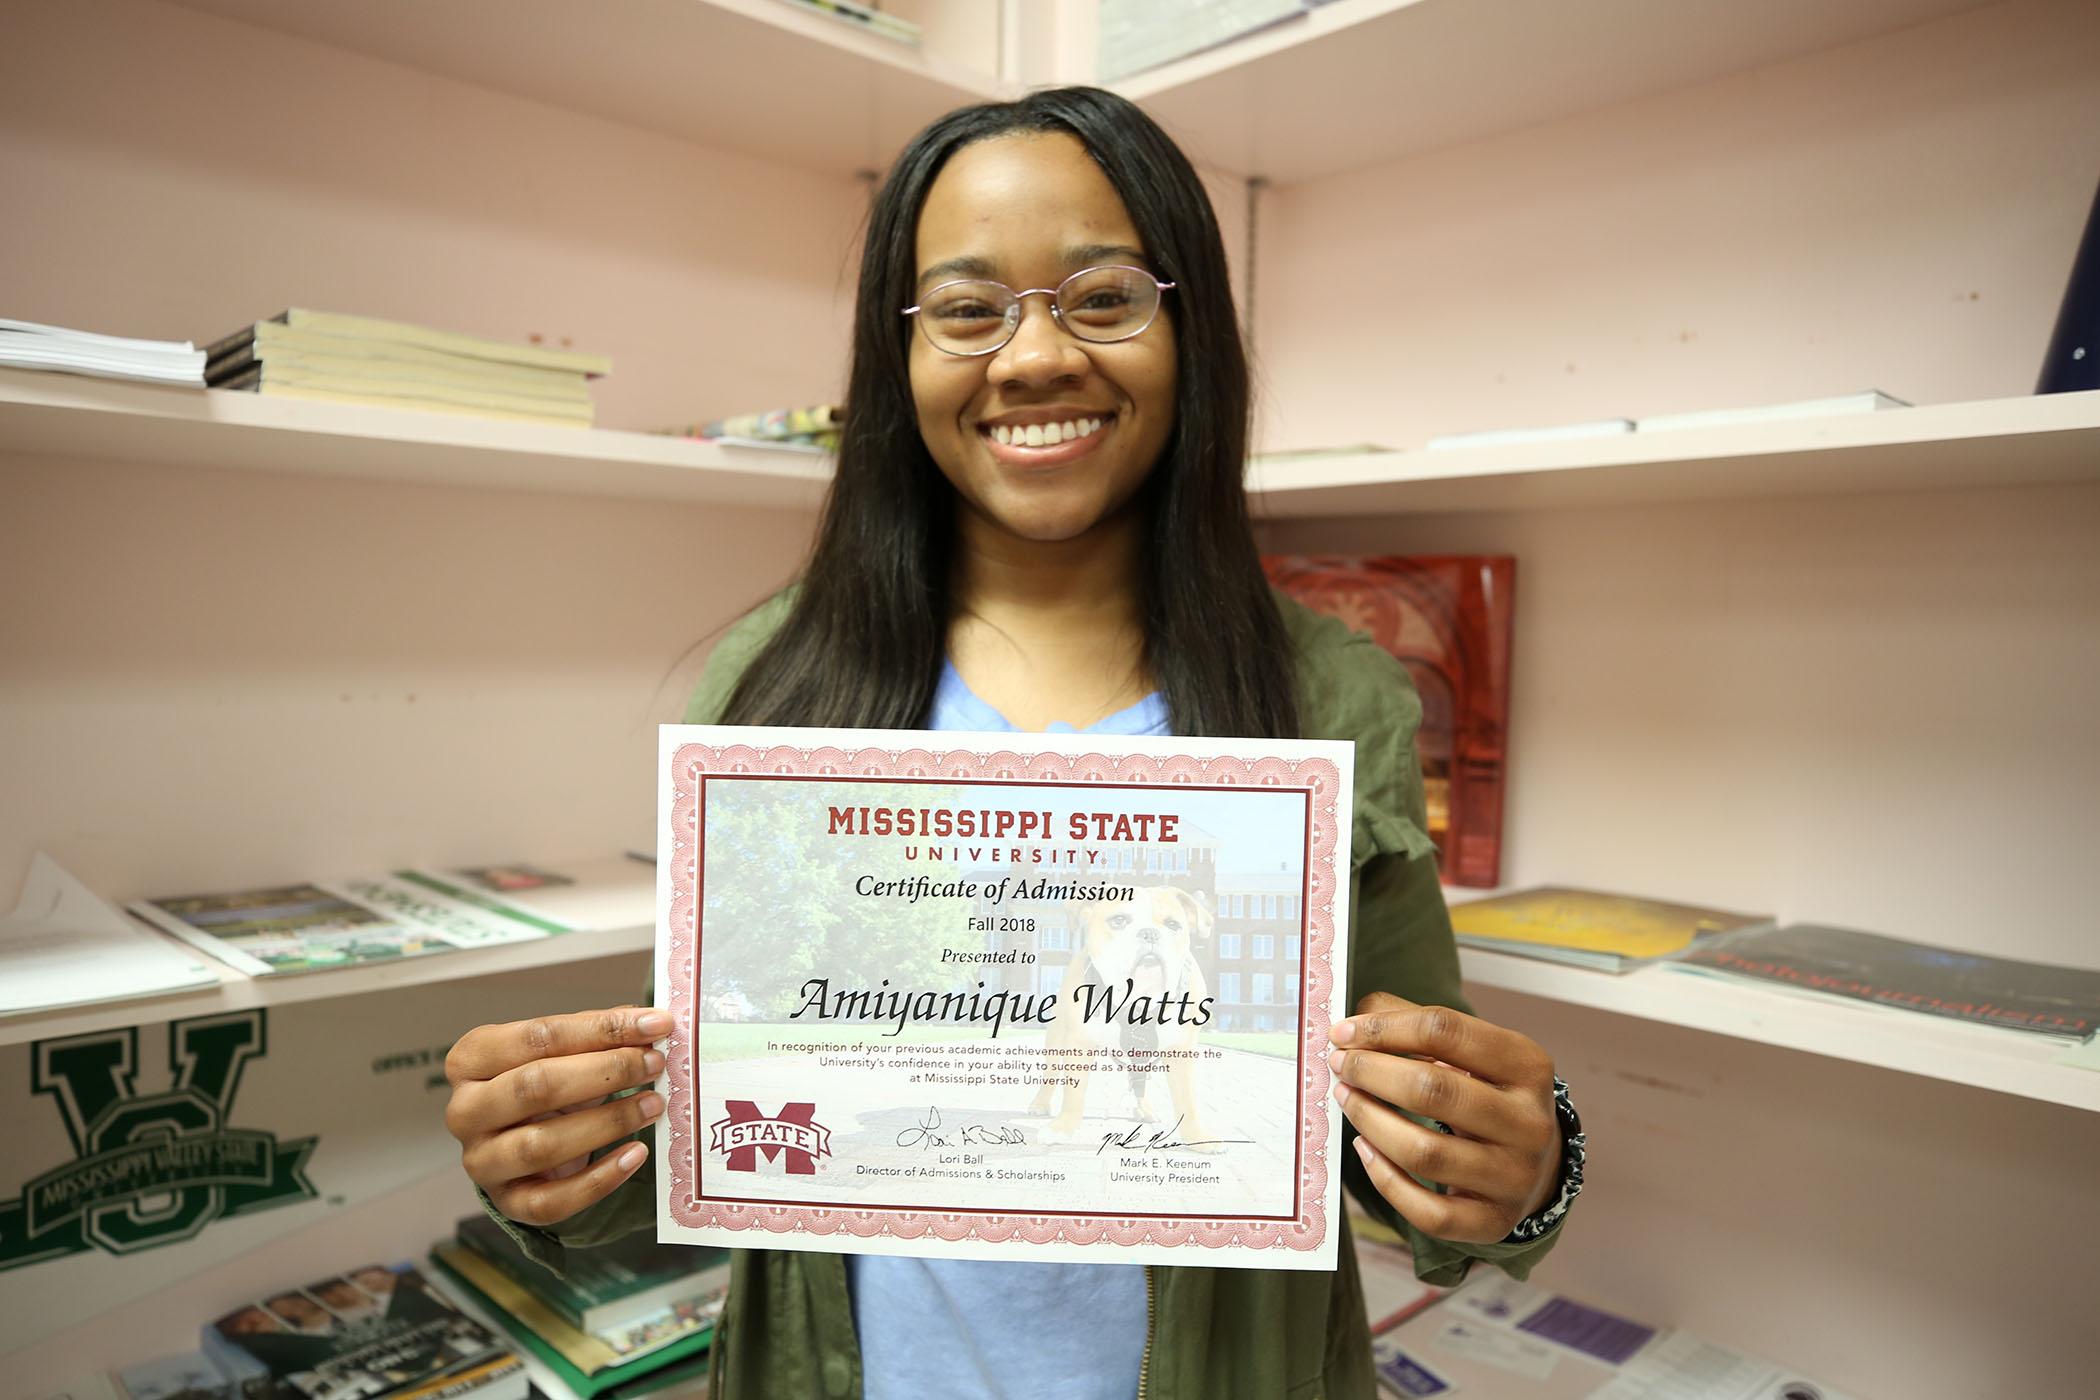 Amiya holds her admission letter to Mississippi State University.